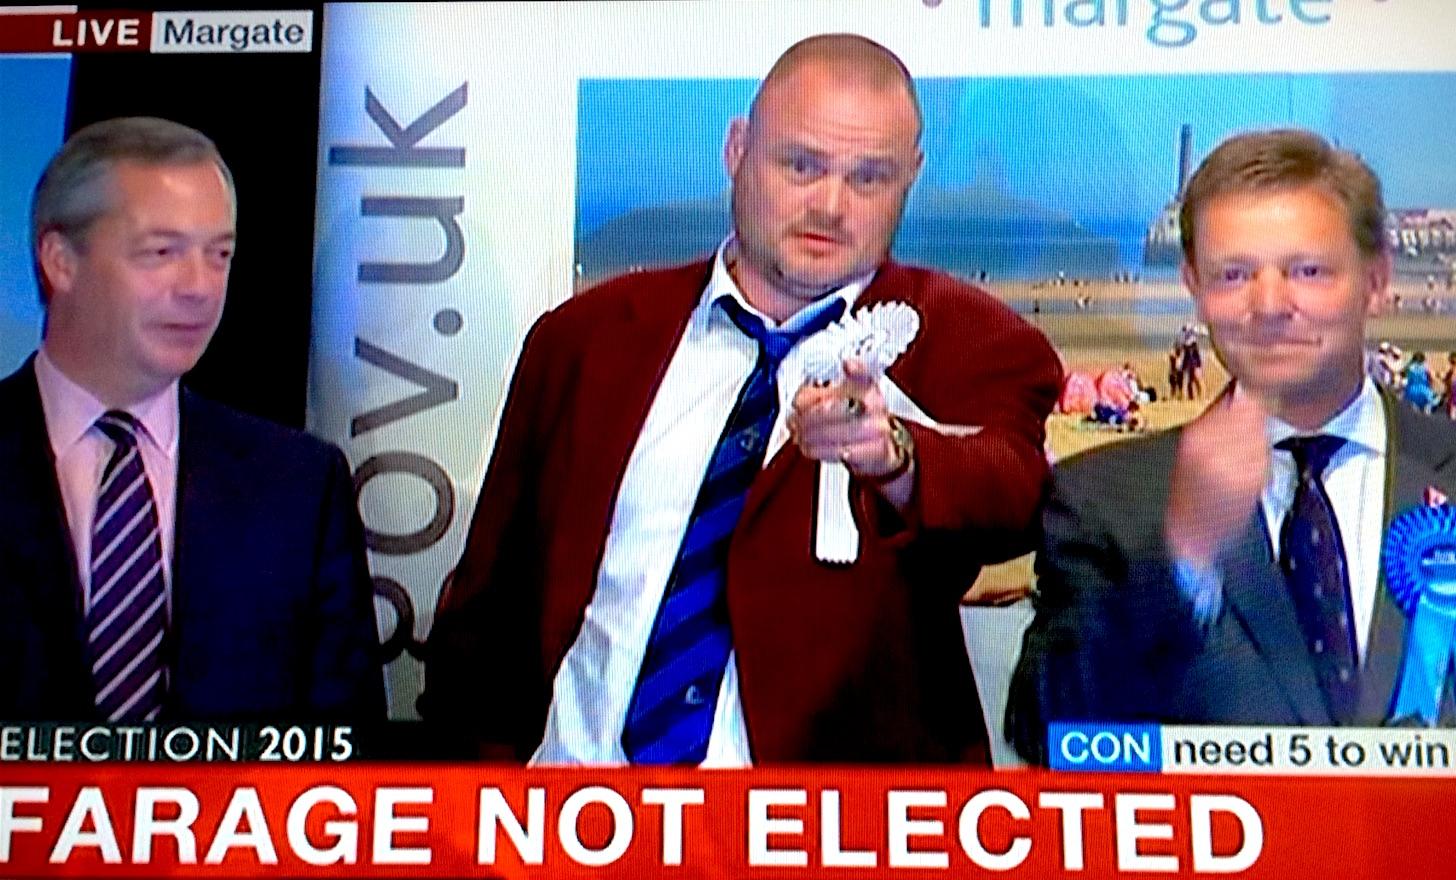 Nigel Farage (left), comic Al Murray (centre) & Thanet South winner, Conservative Craig Mackinley